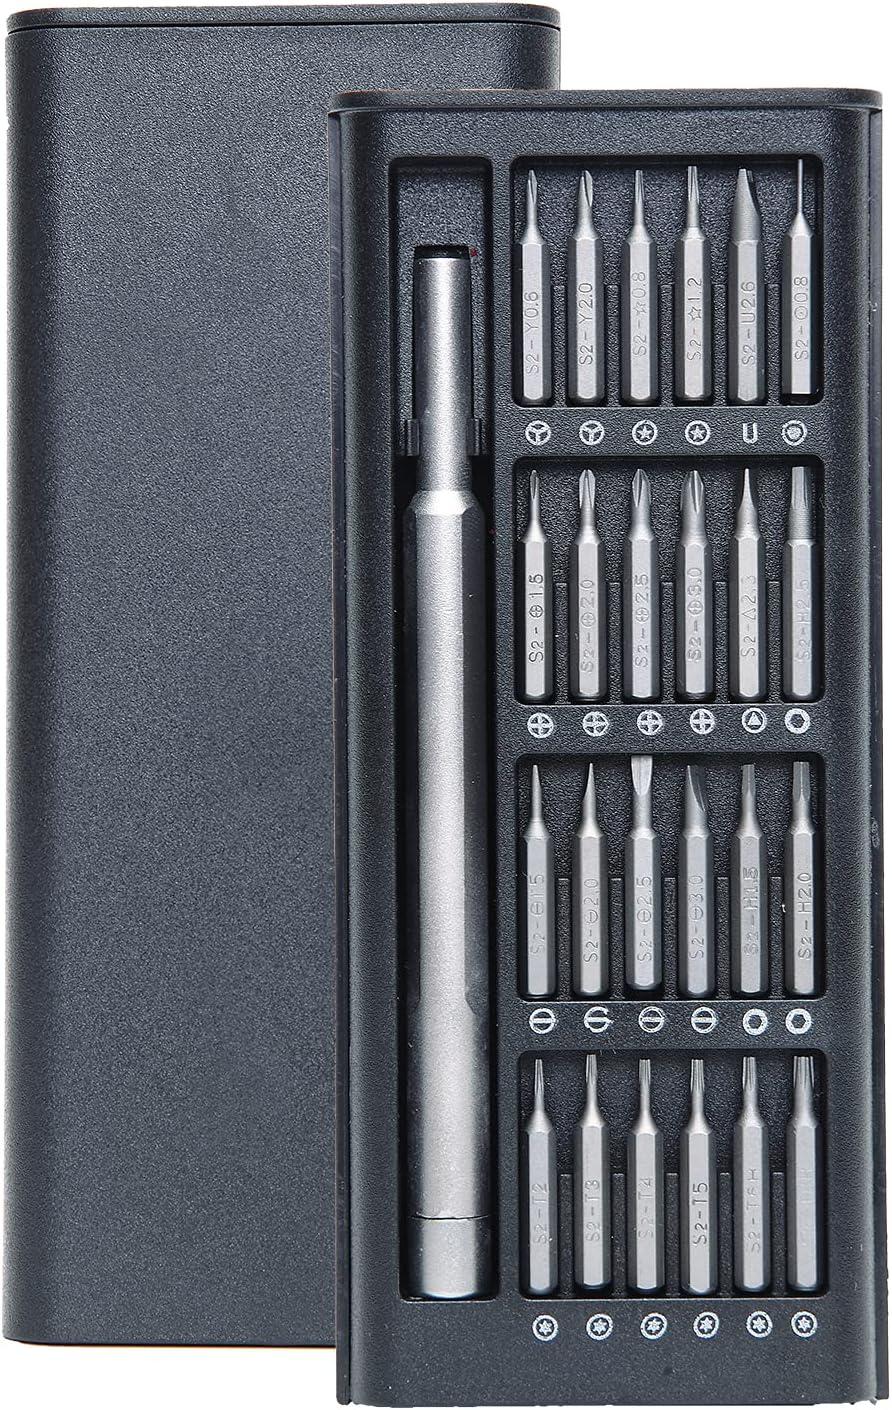 25 In 1 Precision Magnetic Bits DIY Dismountable Screw Driver Se